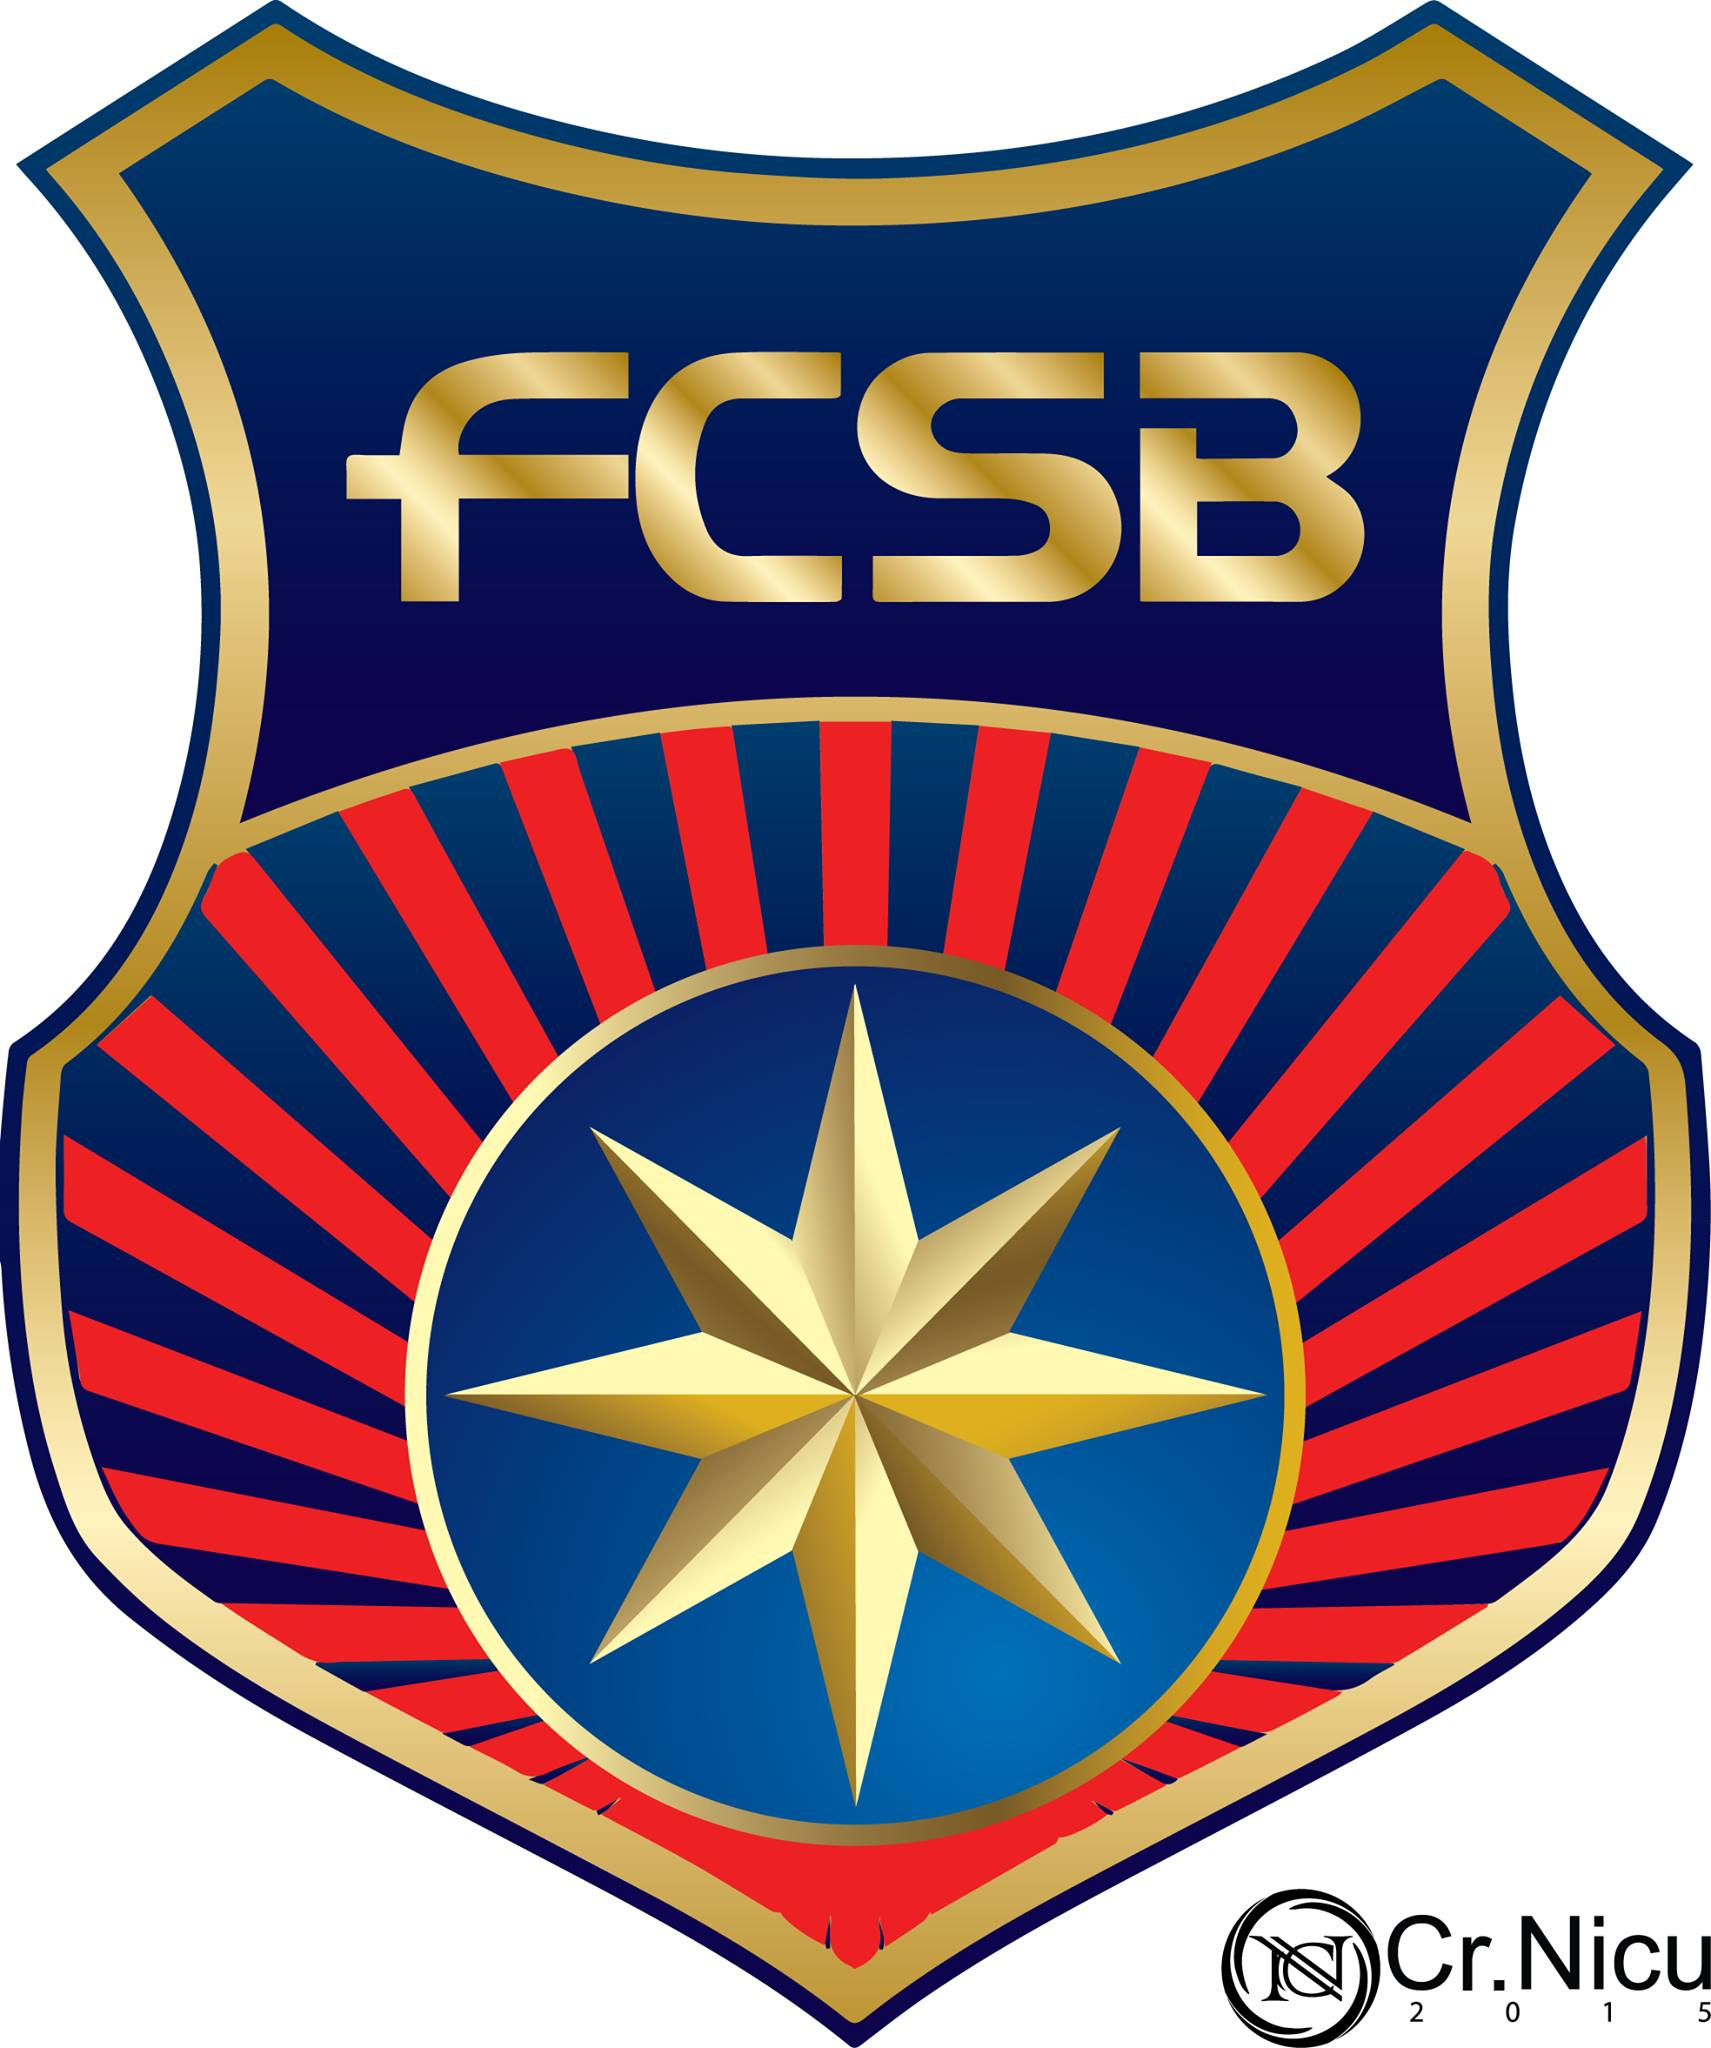 F.C.S.B.